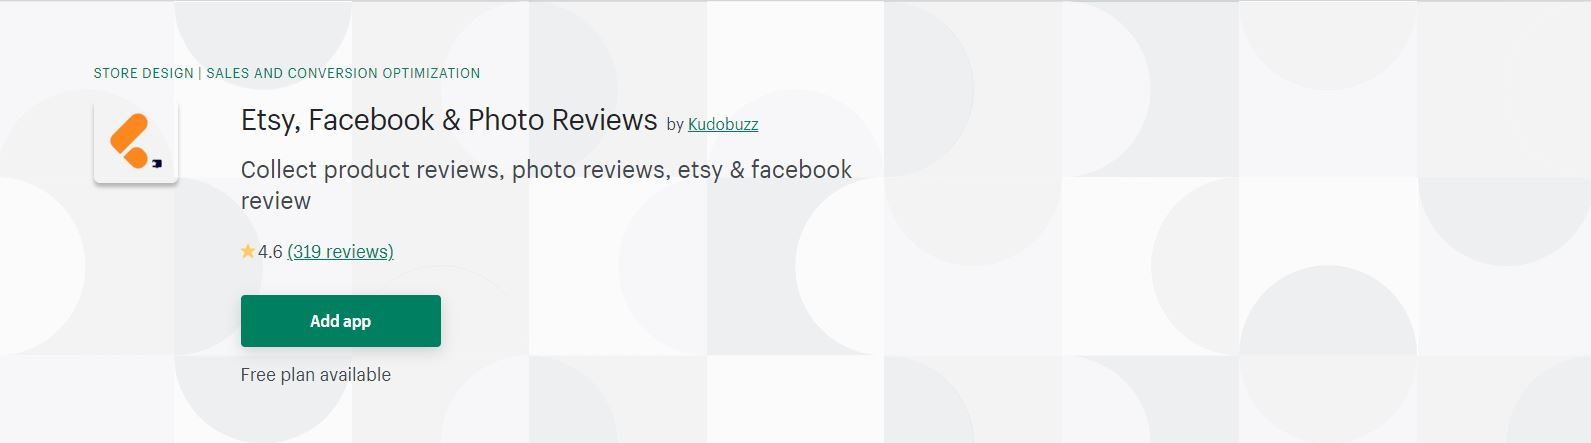 Etsy, Facebook & Photo Reviews